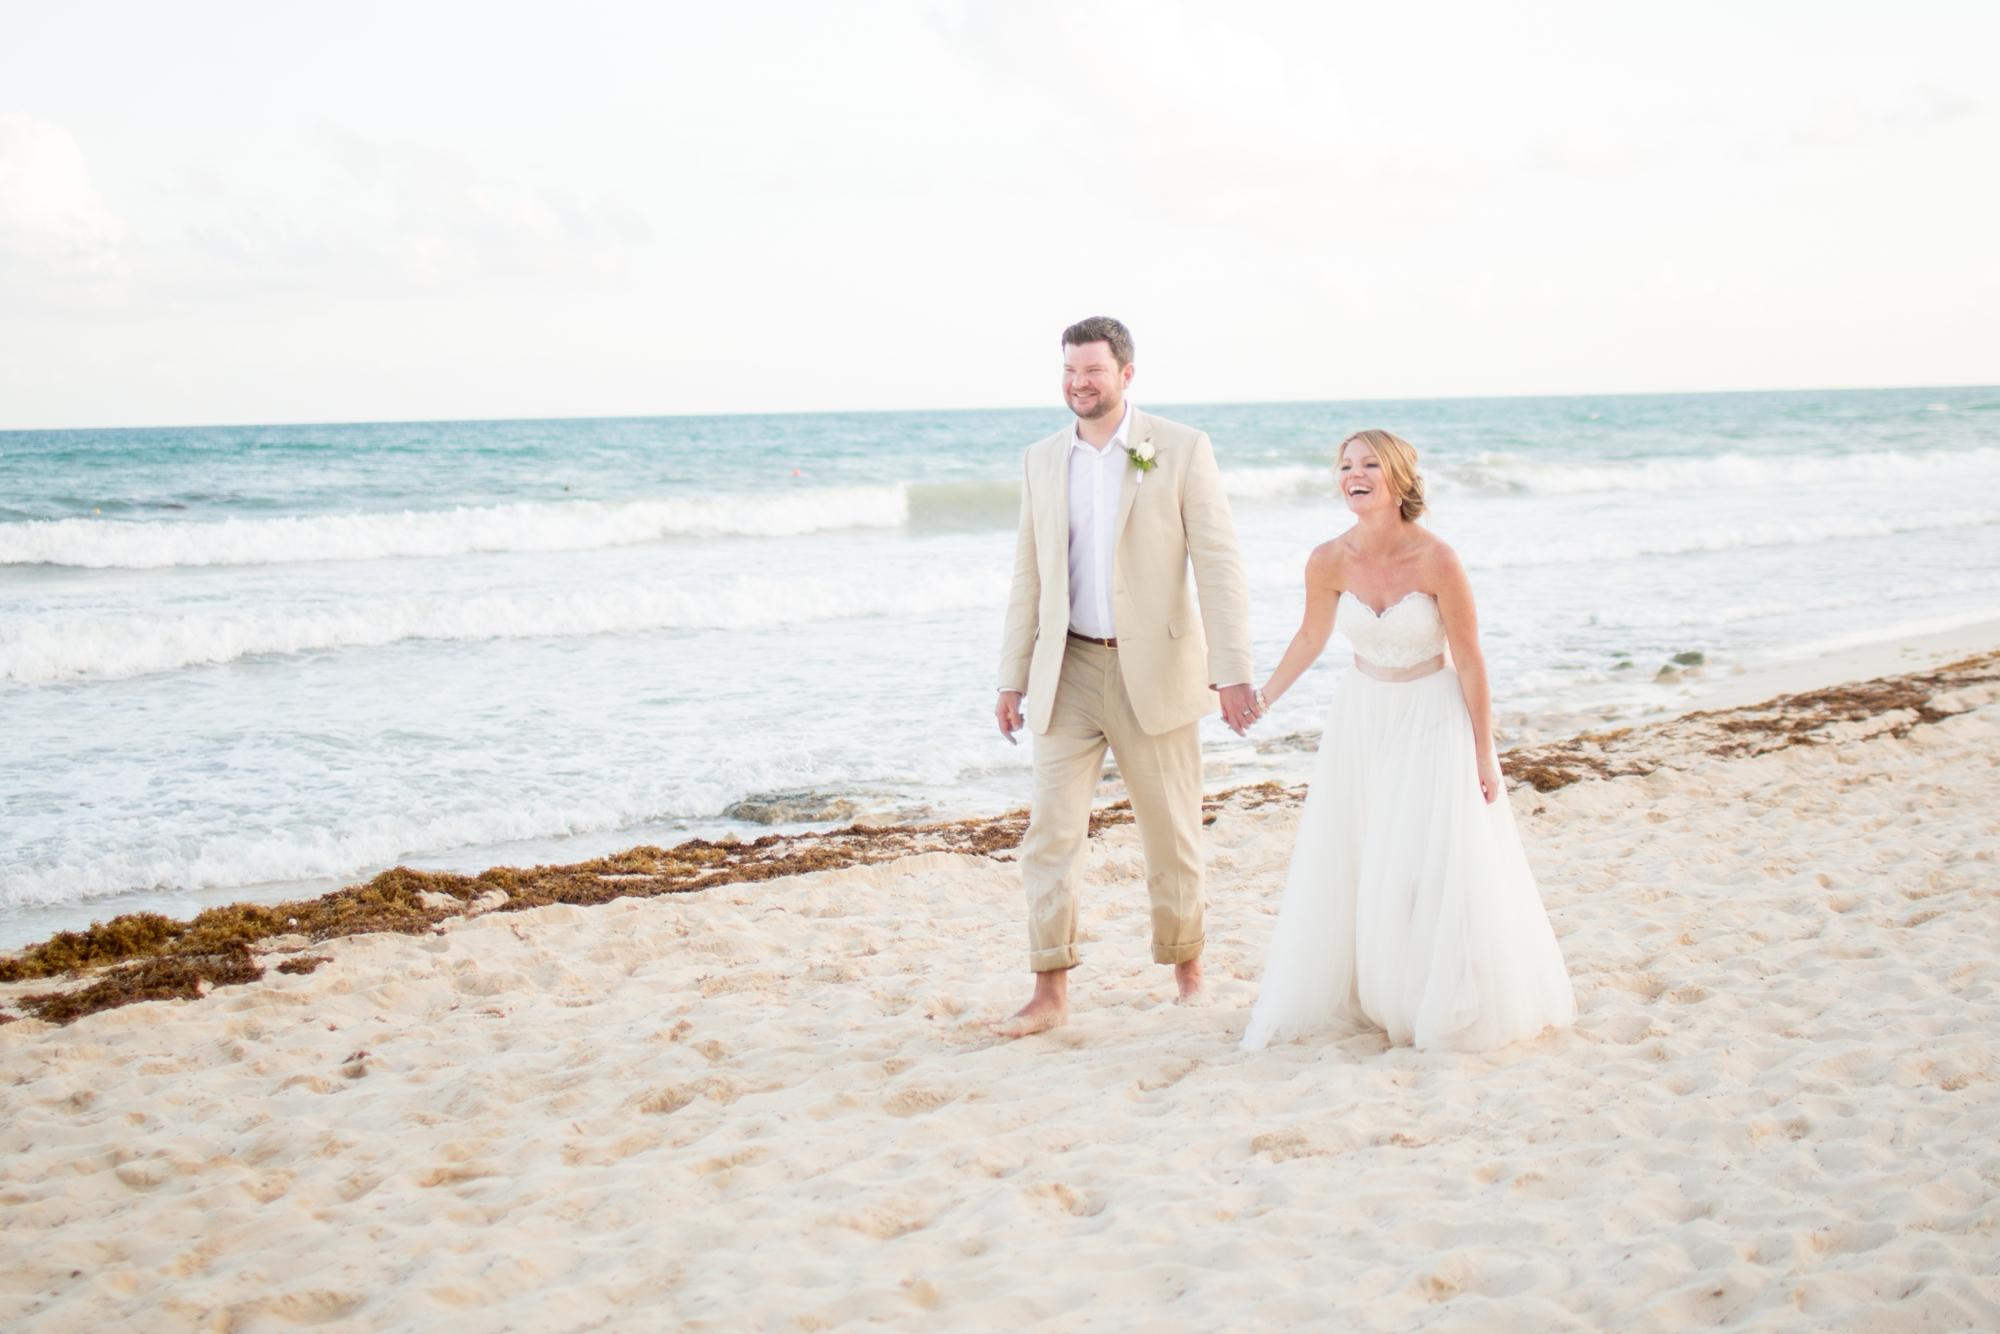 Morosoff Wedding 4-Bride & Groom Portraits-442_anna grace photography destination wedding photographer playa del carmen mexico photo.jpg